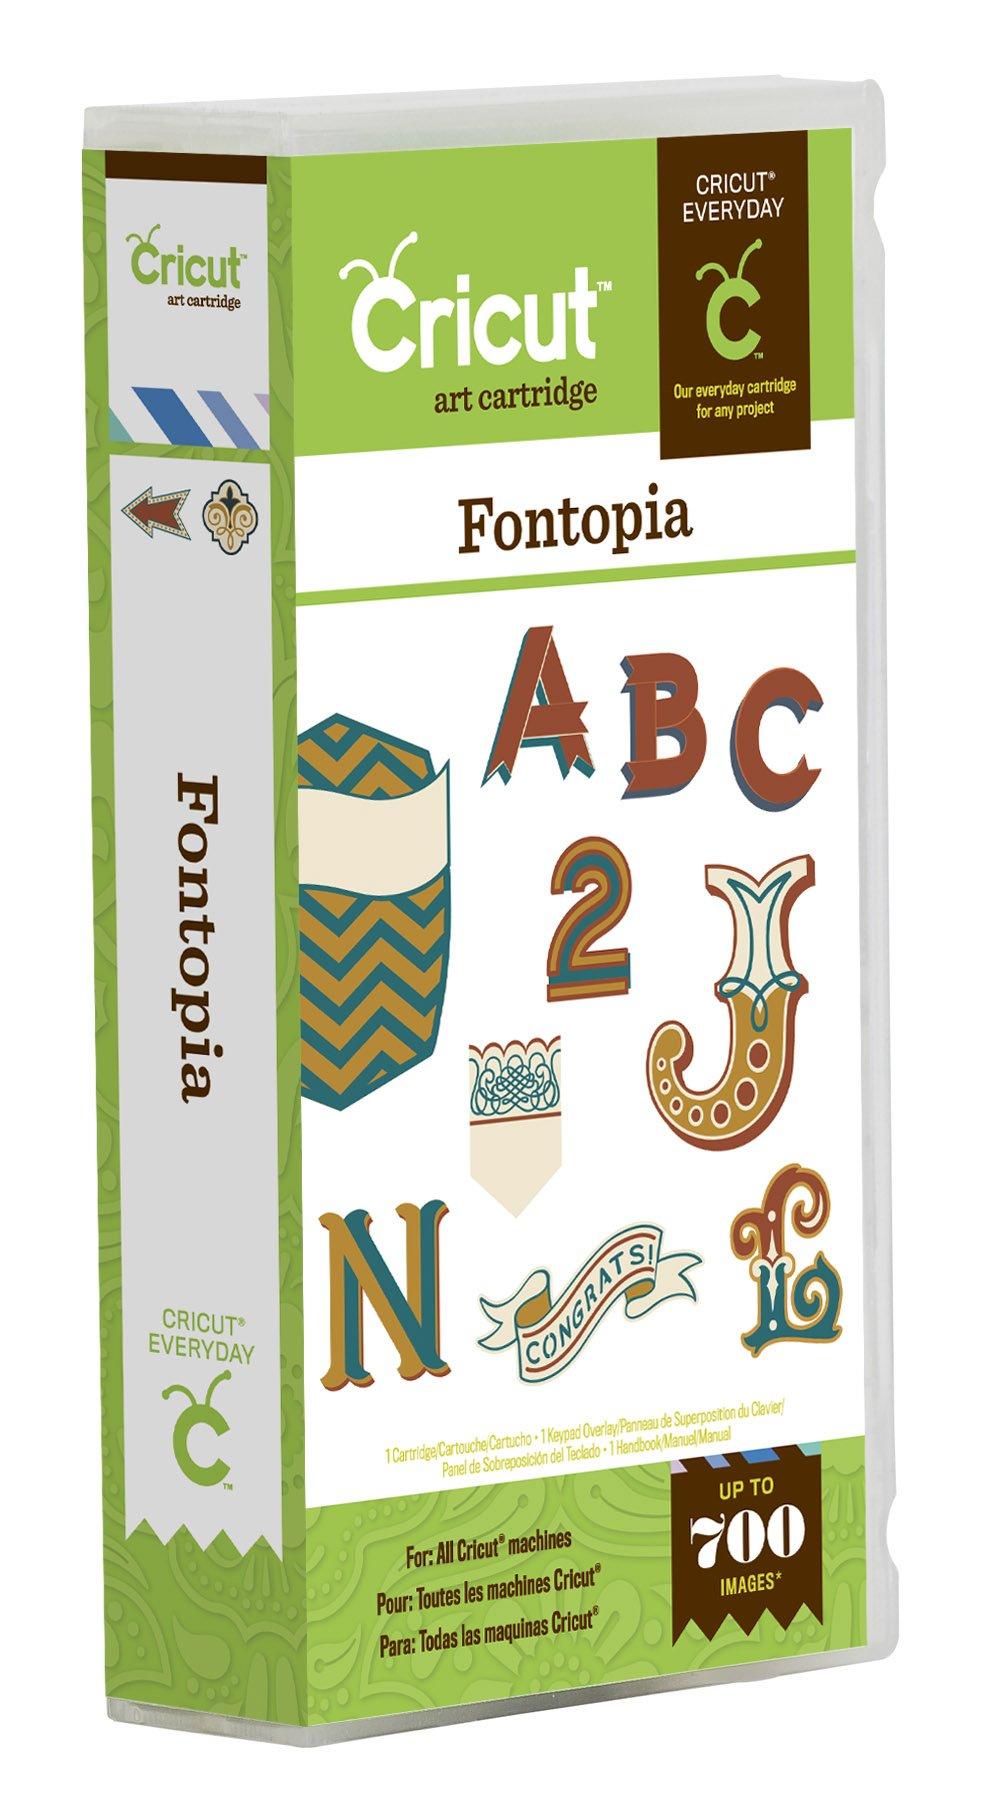 Cricut 2001755 Fontopia Cartridge